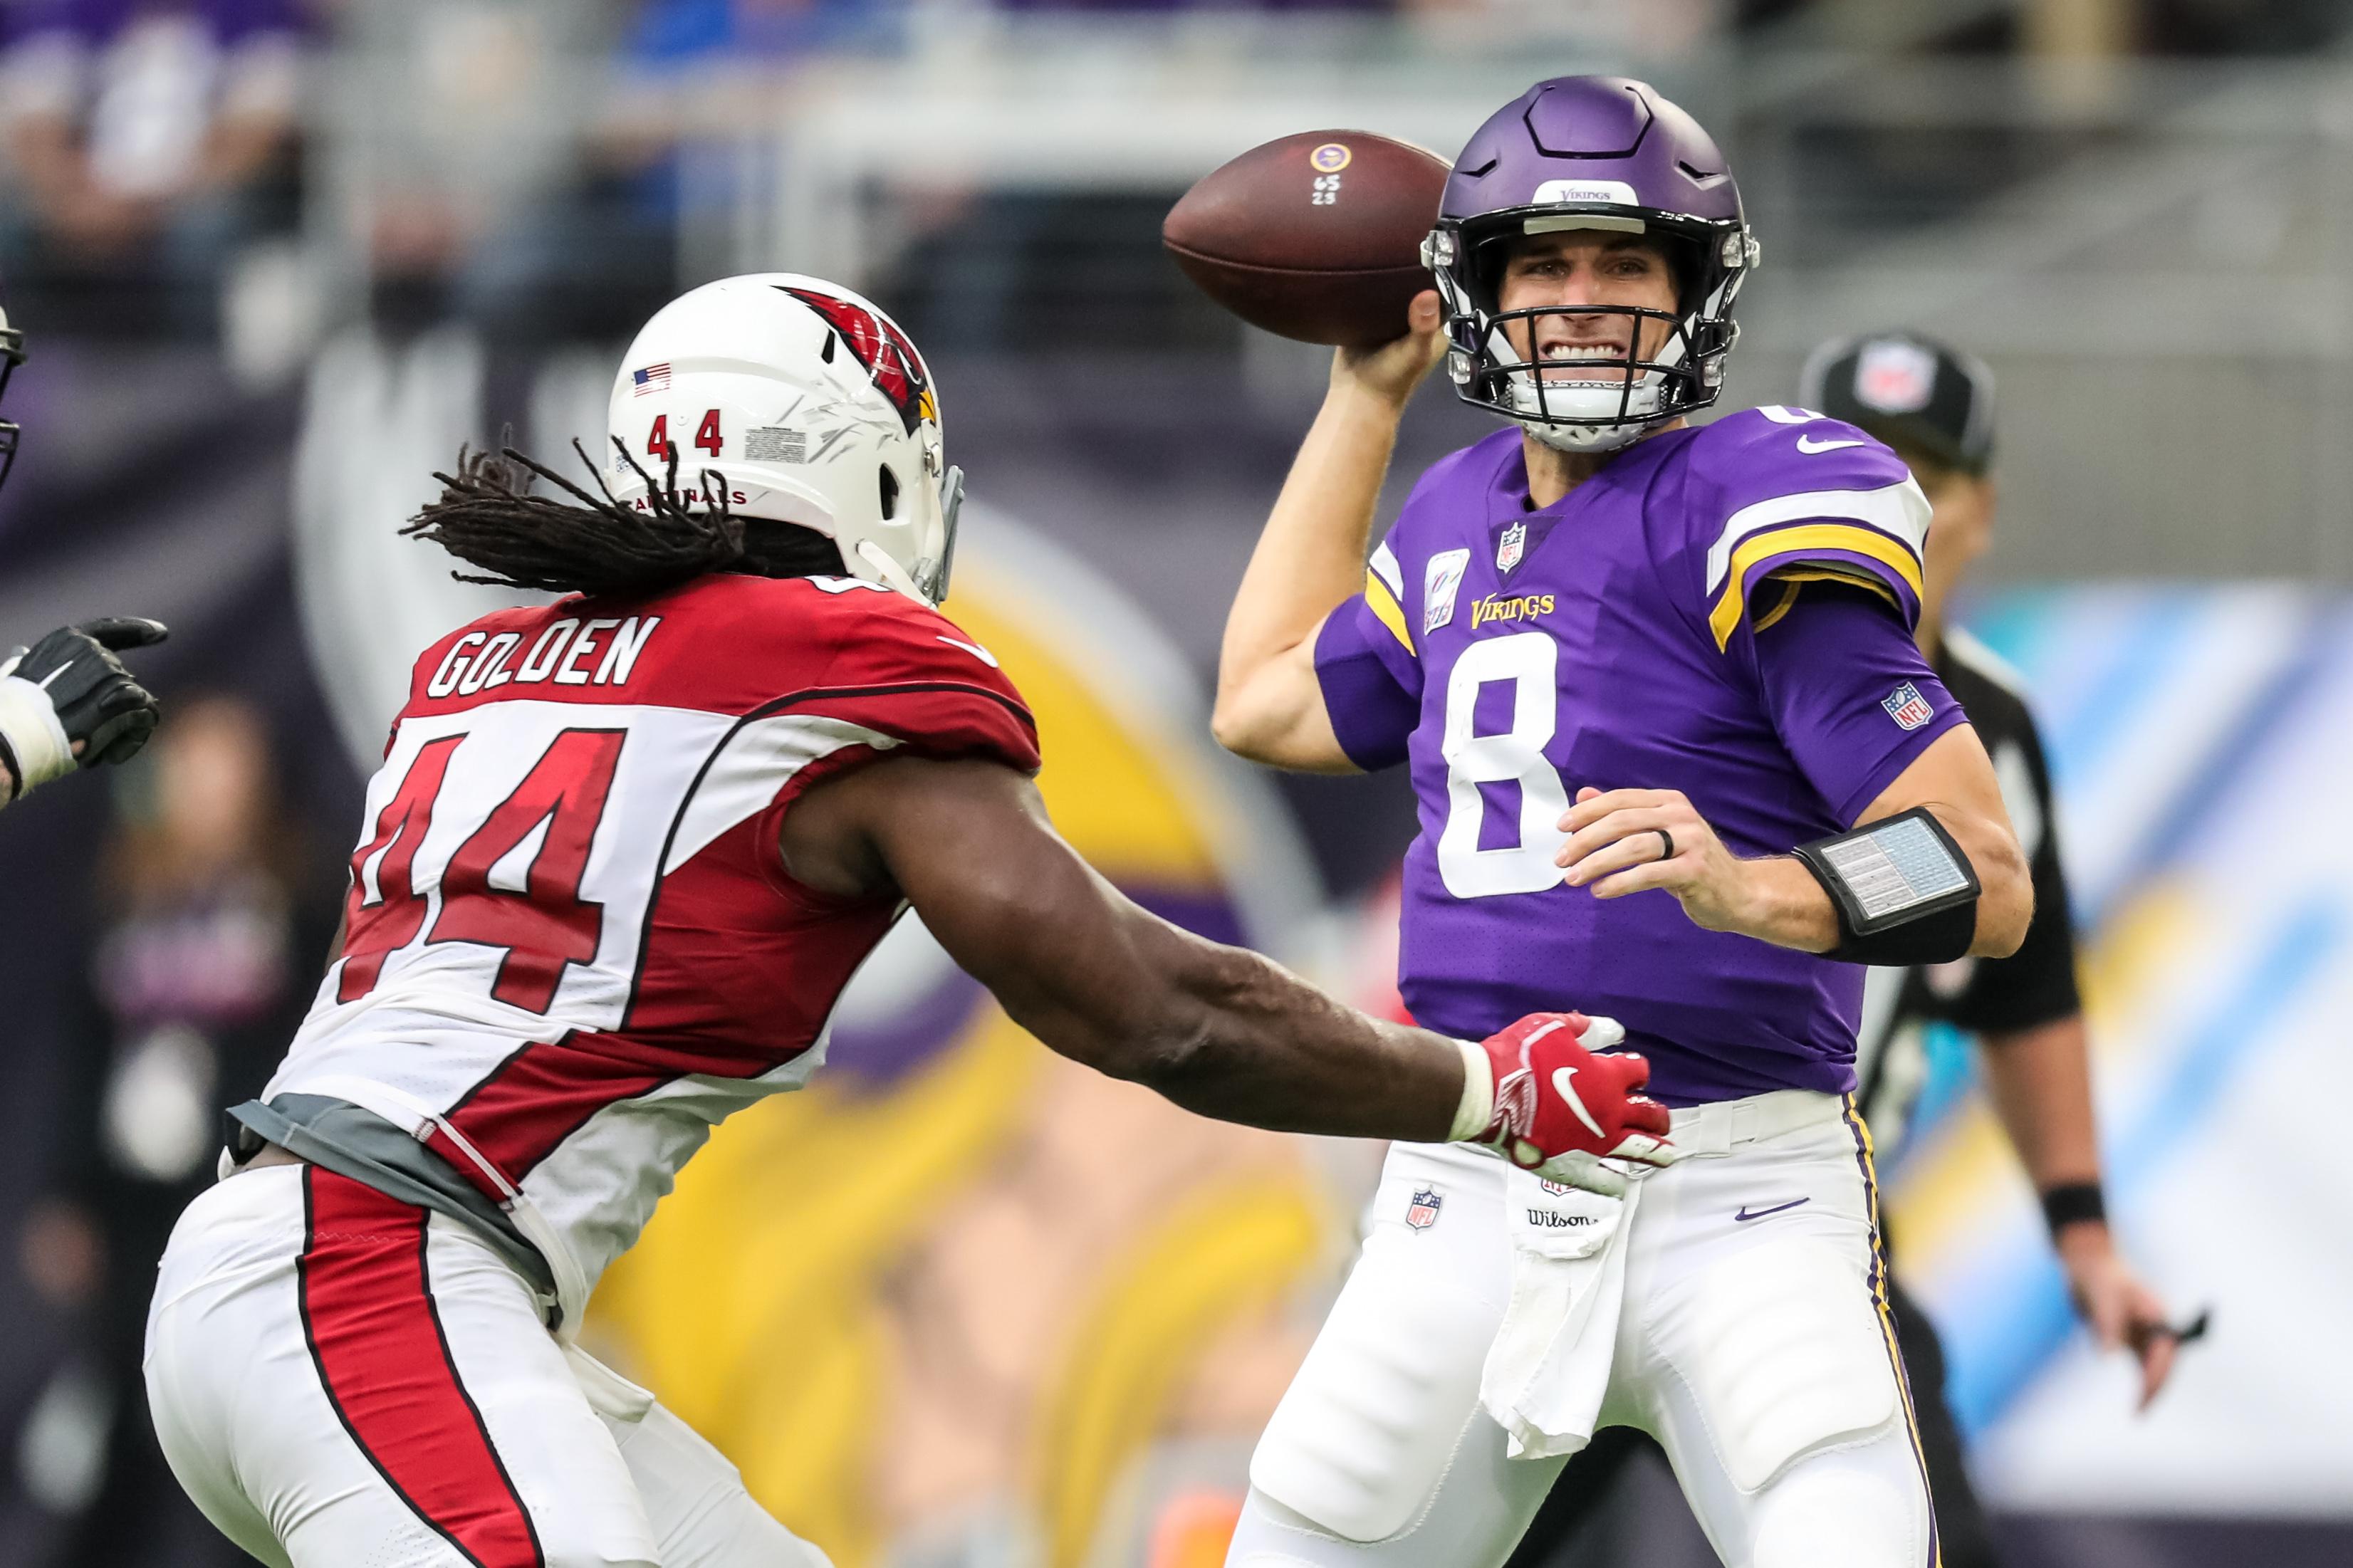 NFL: Arizona Cardinals at Minnesota Vikings